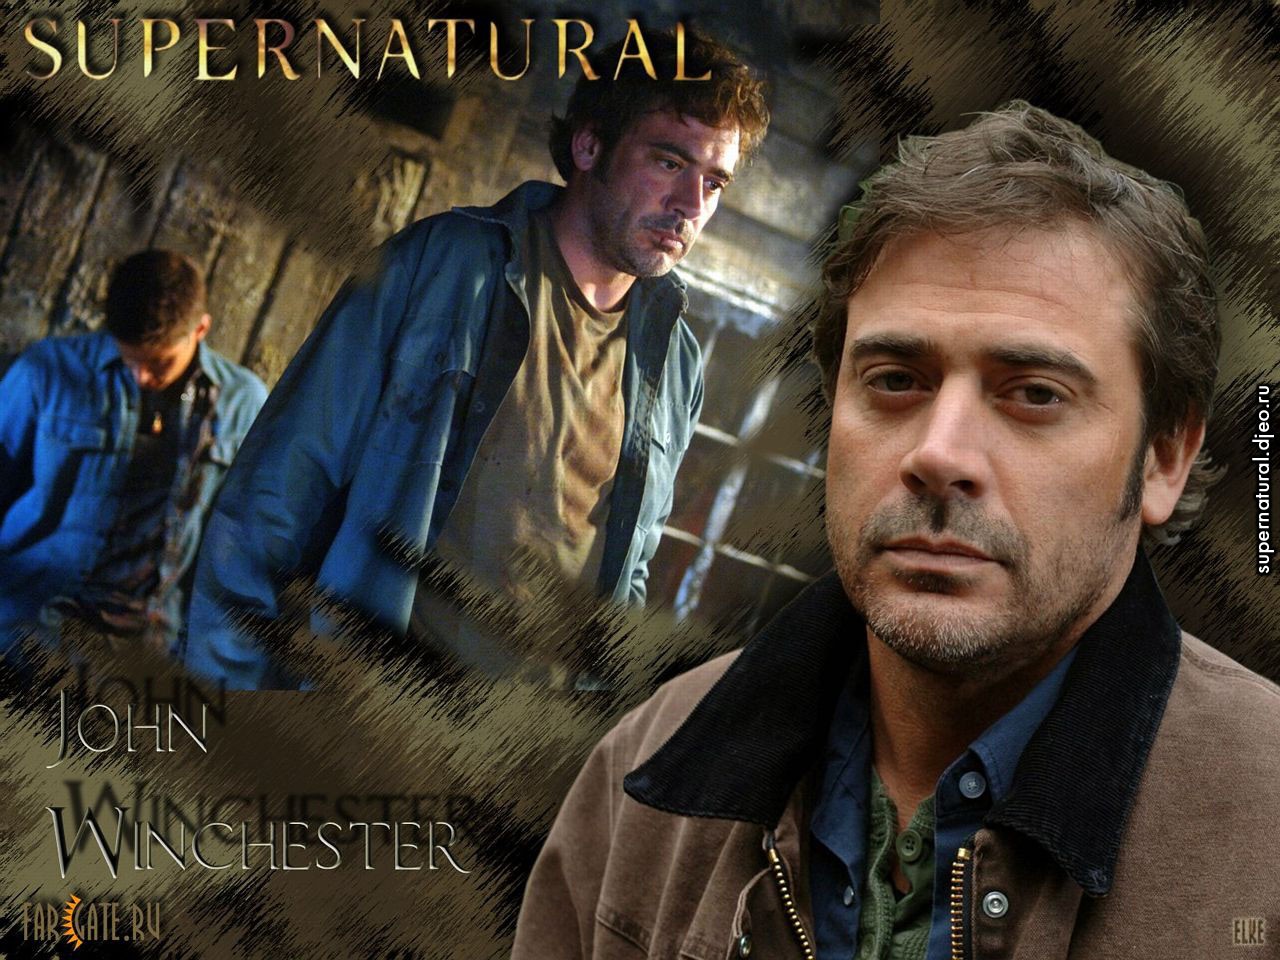 http://supernatural.djeo.ru/images_large/wallpapers/pic028.jpg